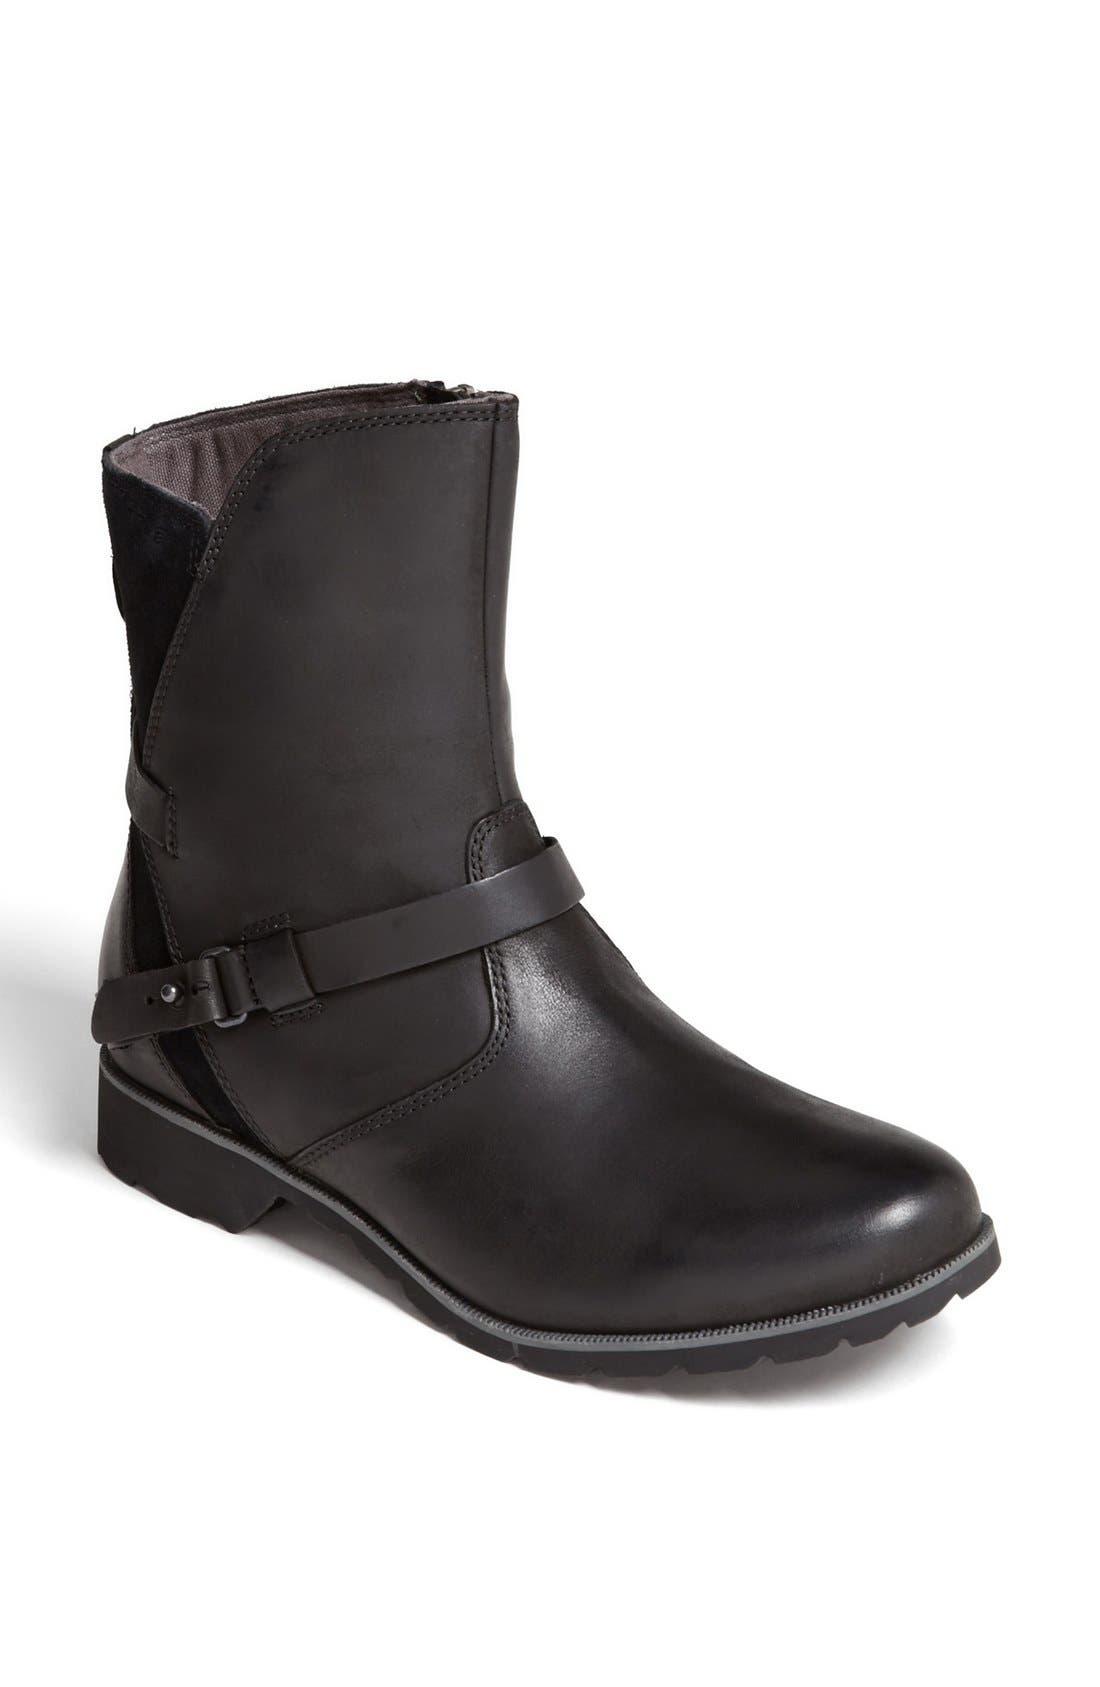 Teva 'De La Vina' Boot